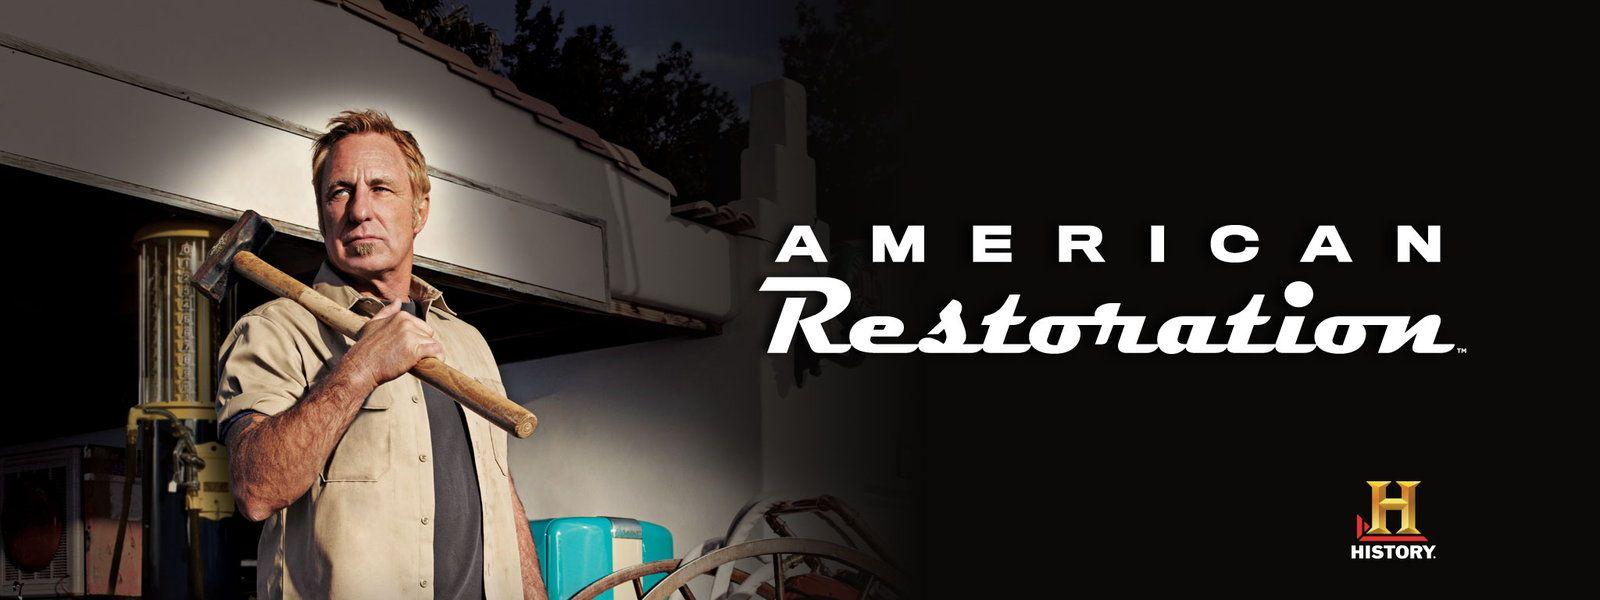 Watch American Restoration online Free Hulu American